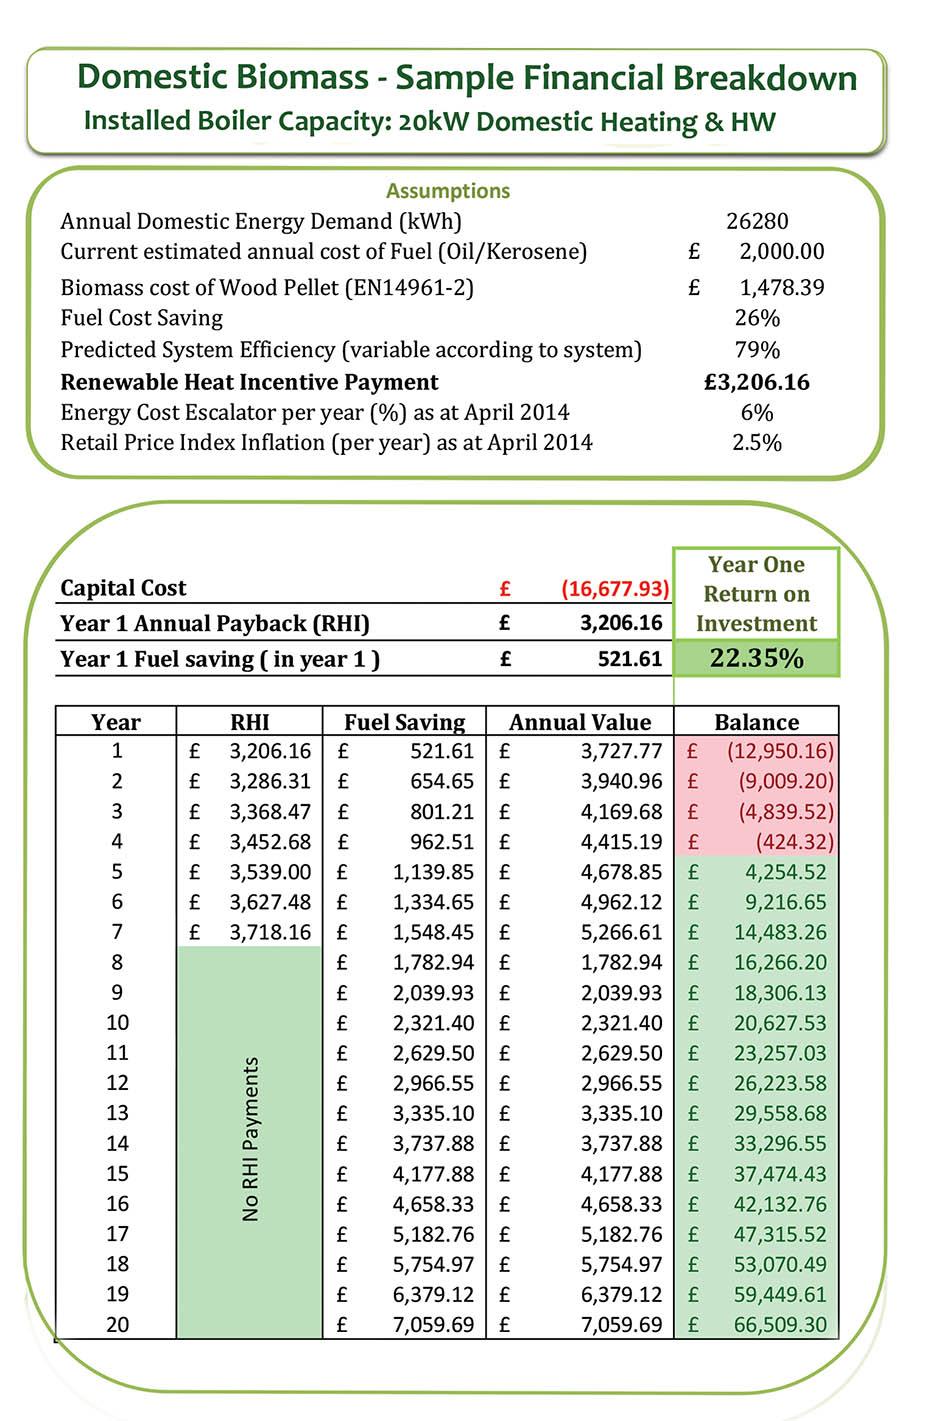 domestic biomass cashflow forecast